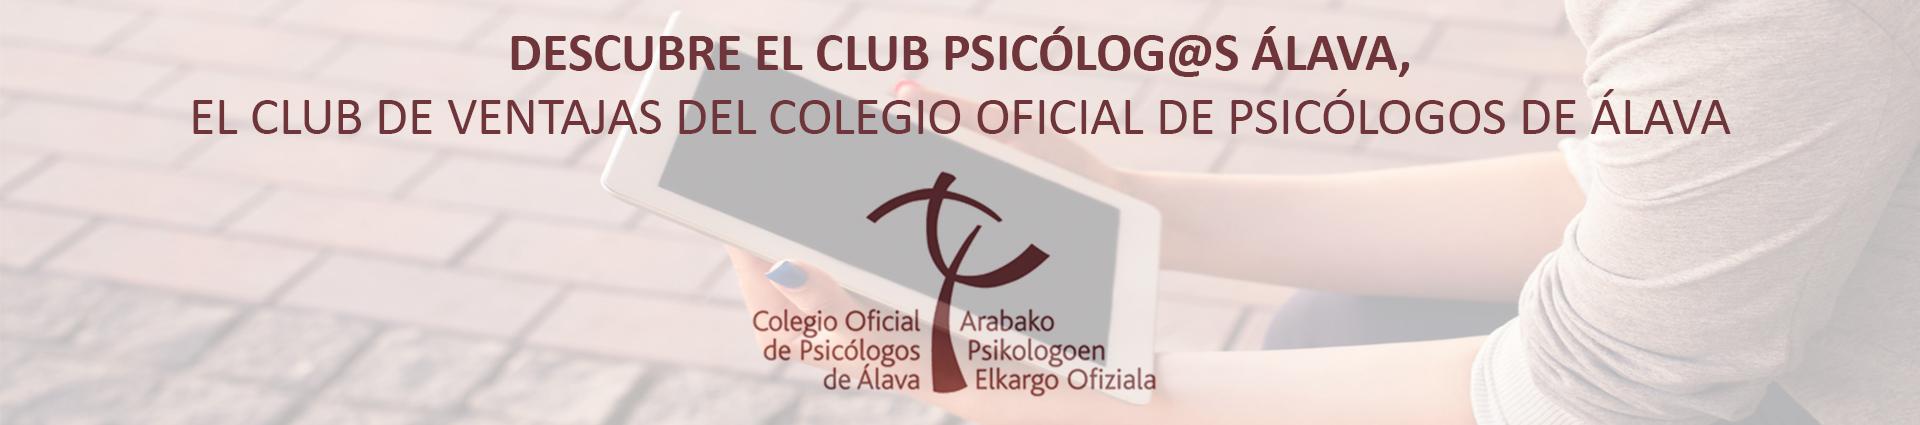 banner-club-psicologos-alava